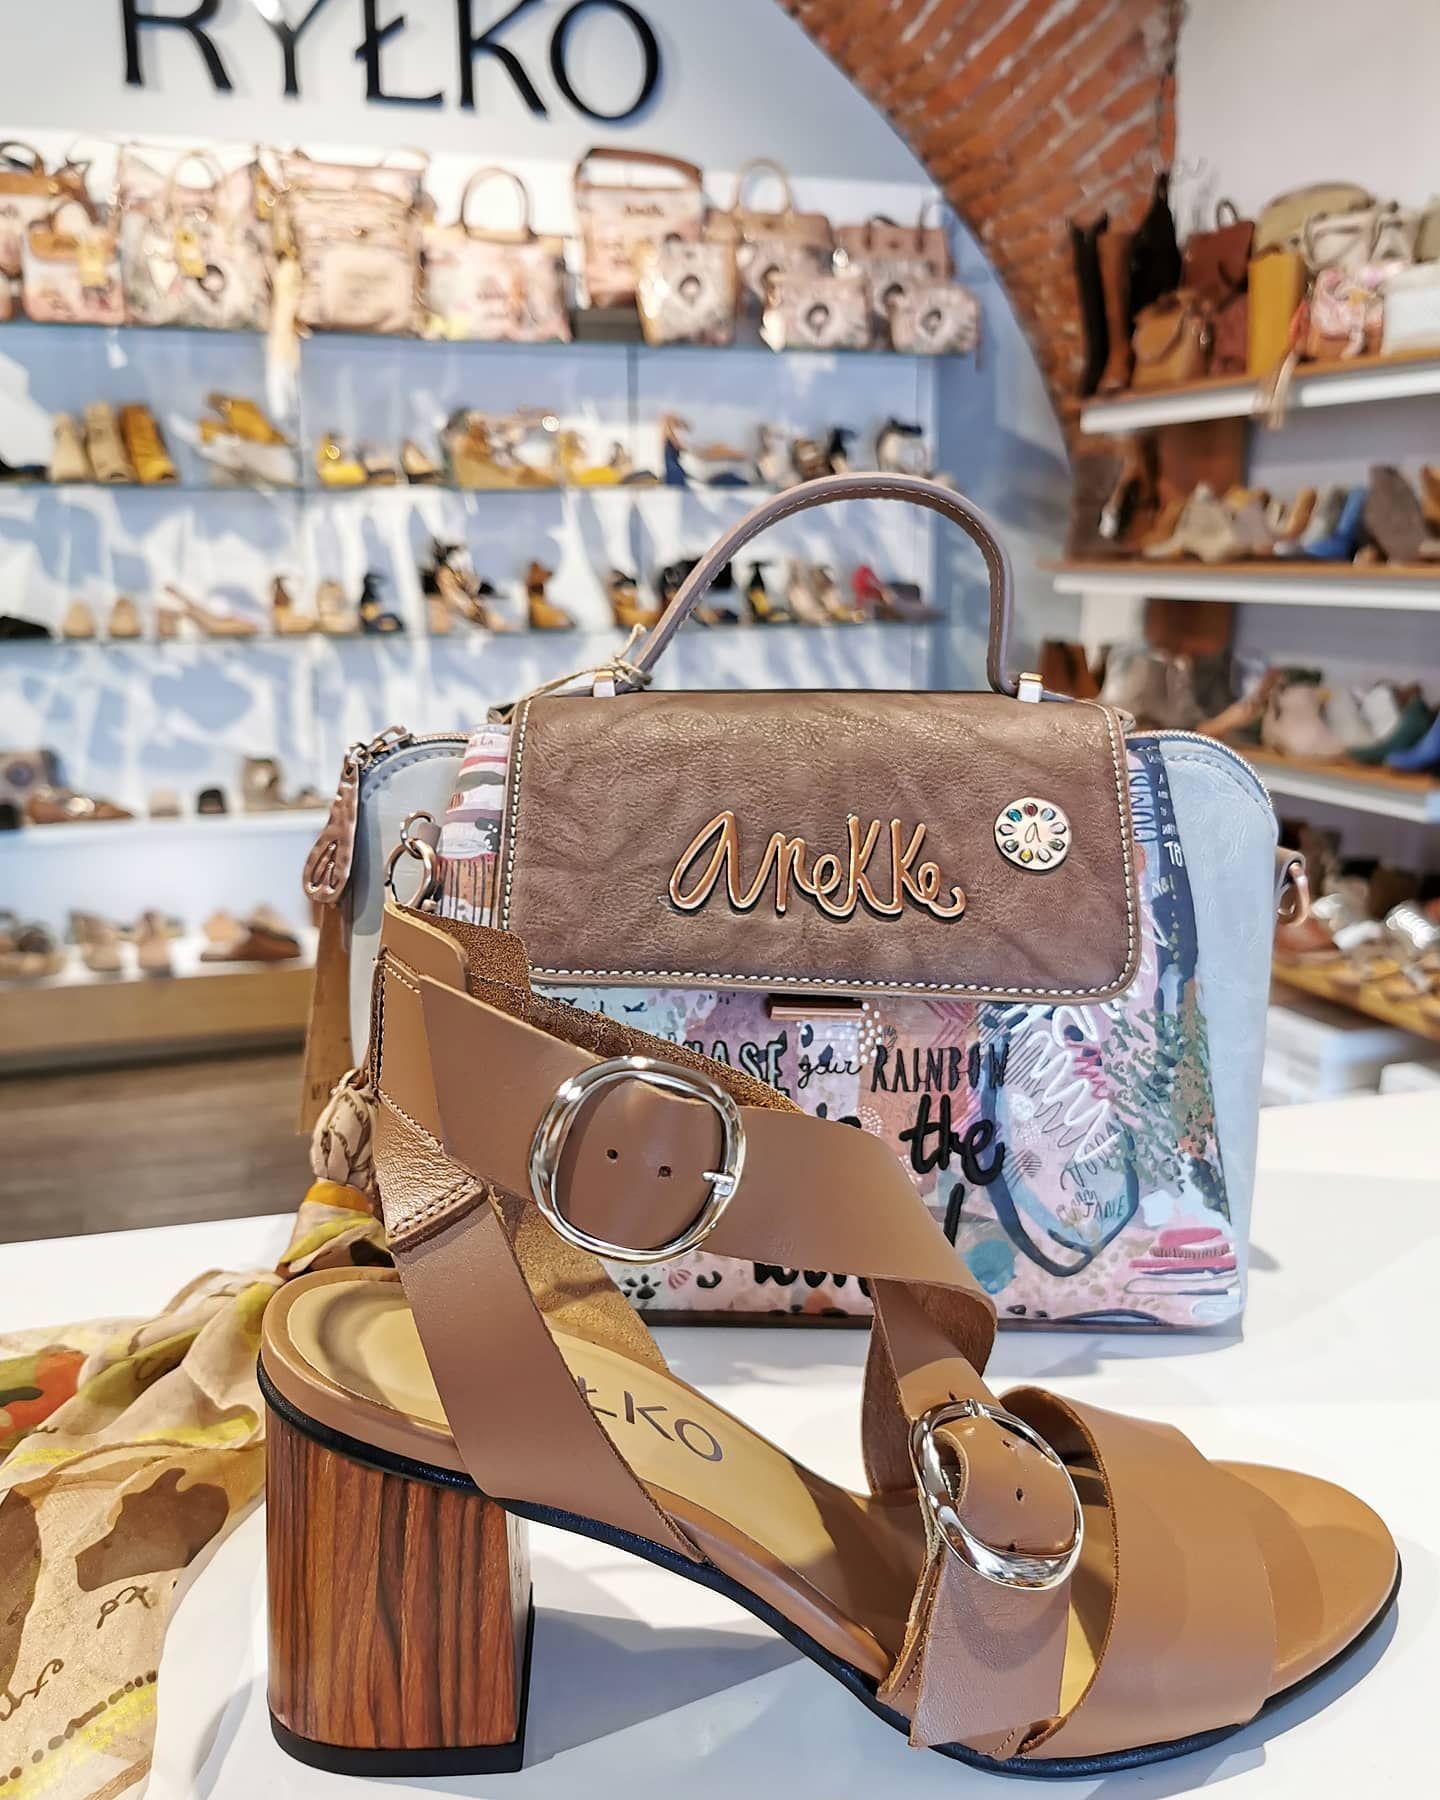 Karmelowe Sandaly Na Slupkowym Drewnianym Obcasie Rylko Klamerki Nadaja Im Charakteru Rylkoobuwie Rylko Sandaly Highheels Kar Shoulder Bag Shoes Bags